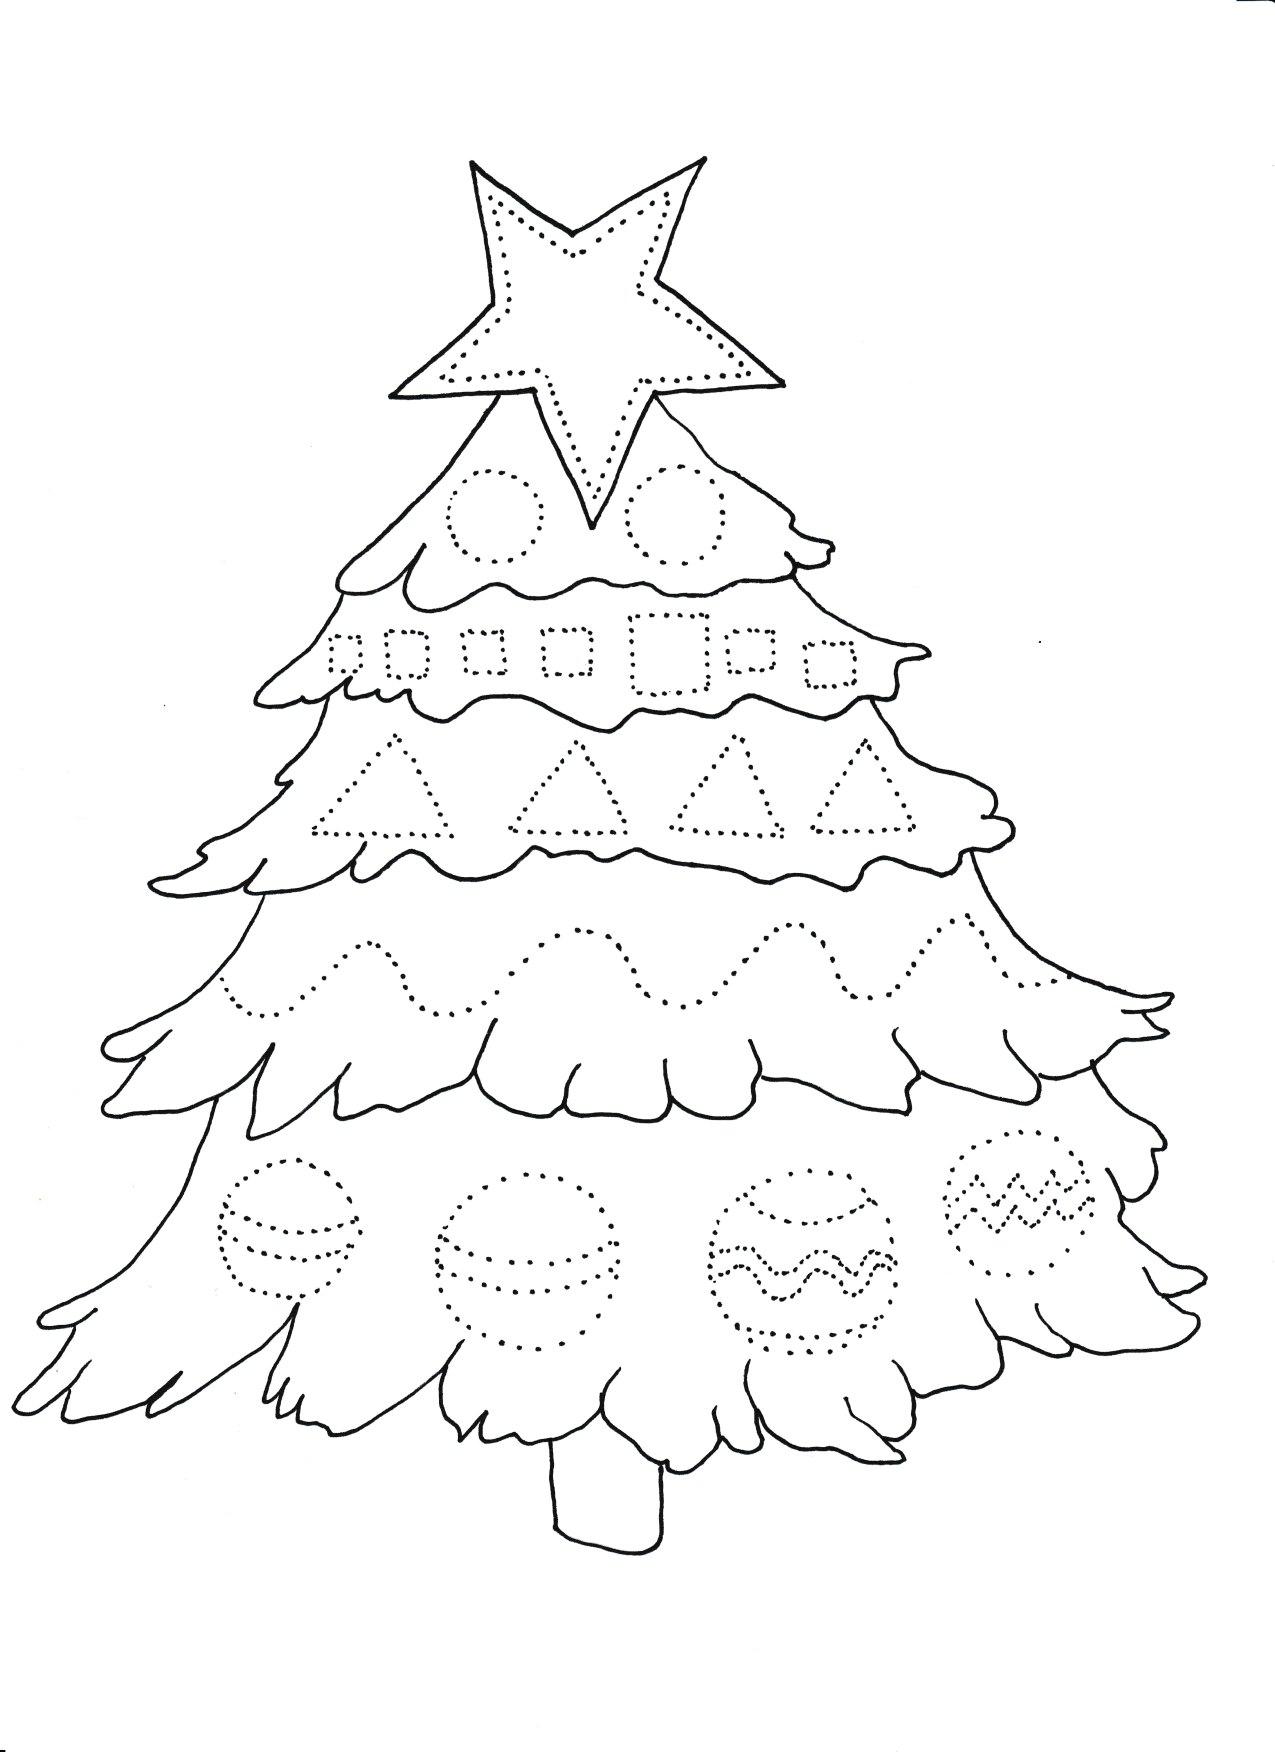 Choinka Grafomotoryka Moje Dzieci Kreatywnie Christmas Crafts For Gifts Christmas Worksheets Christmas Kindergarten